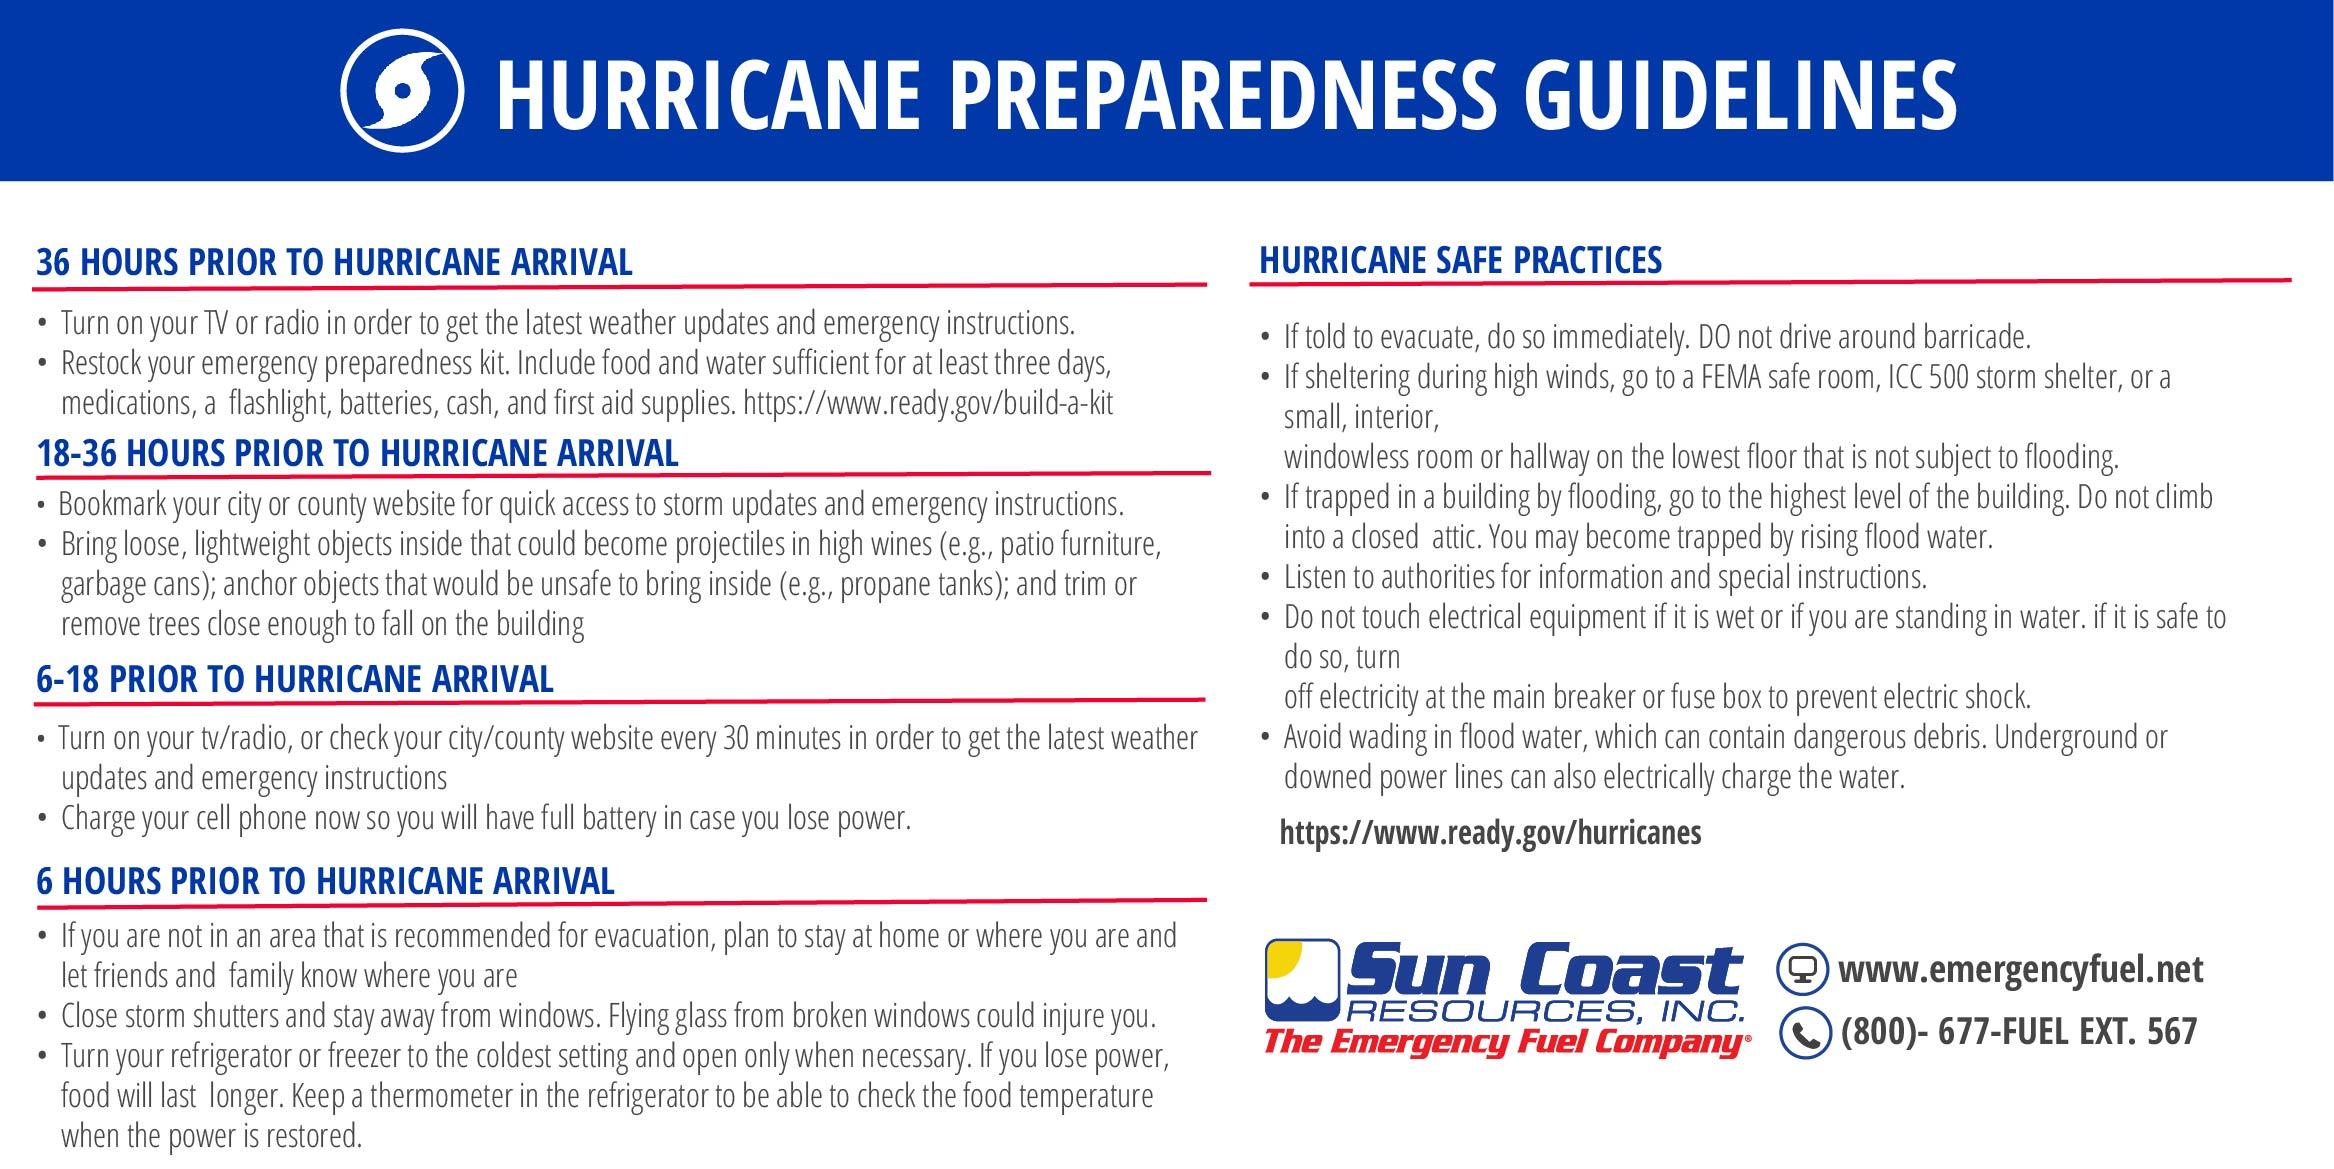 Hurricane preparedness guidelines